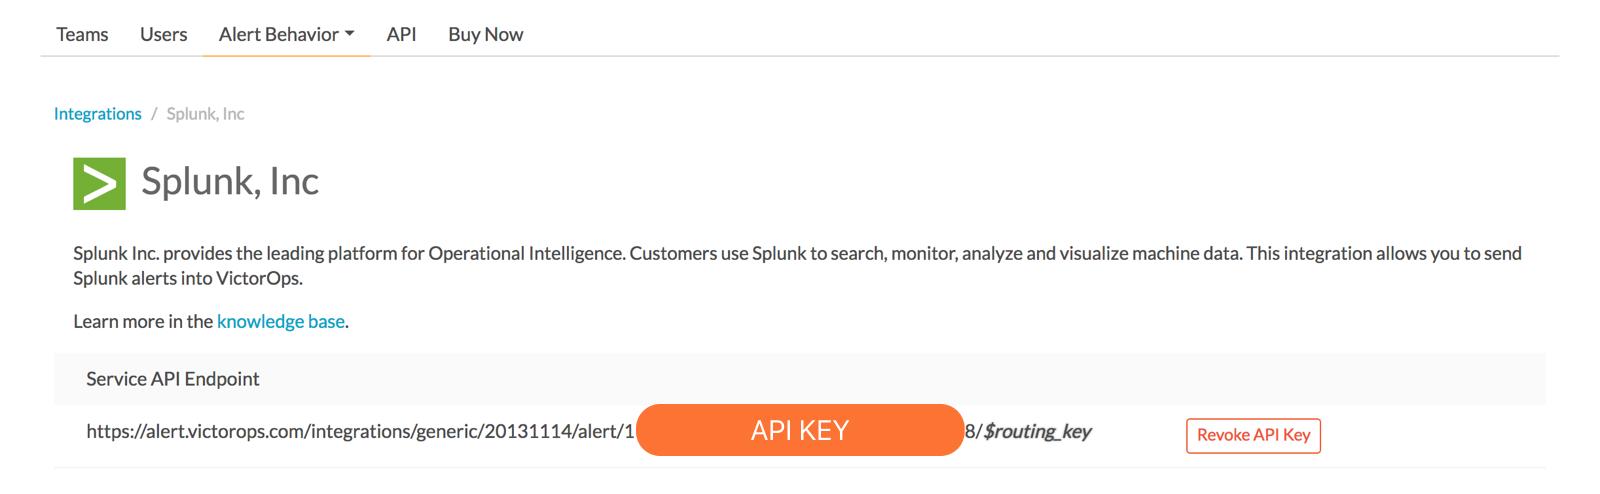 Splunk Integration Guide   VictorOps Knowledge Base